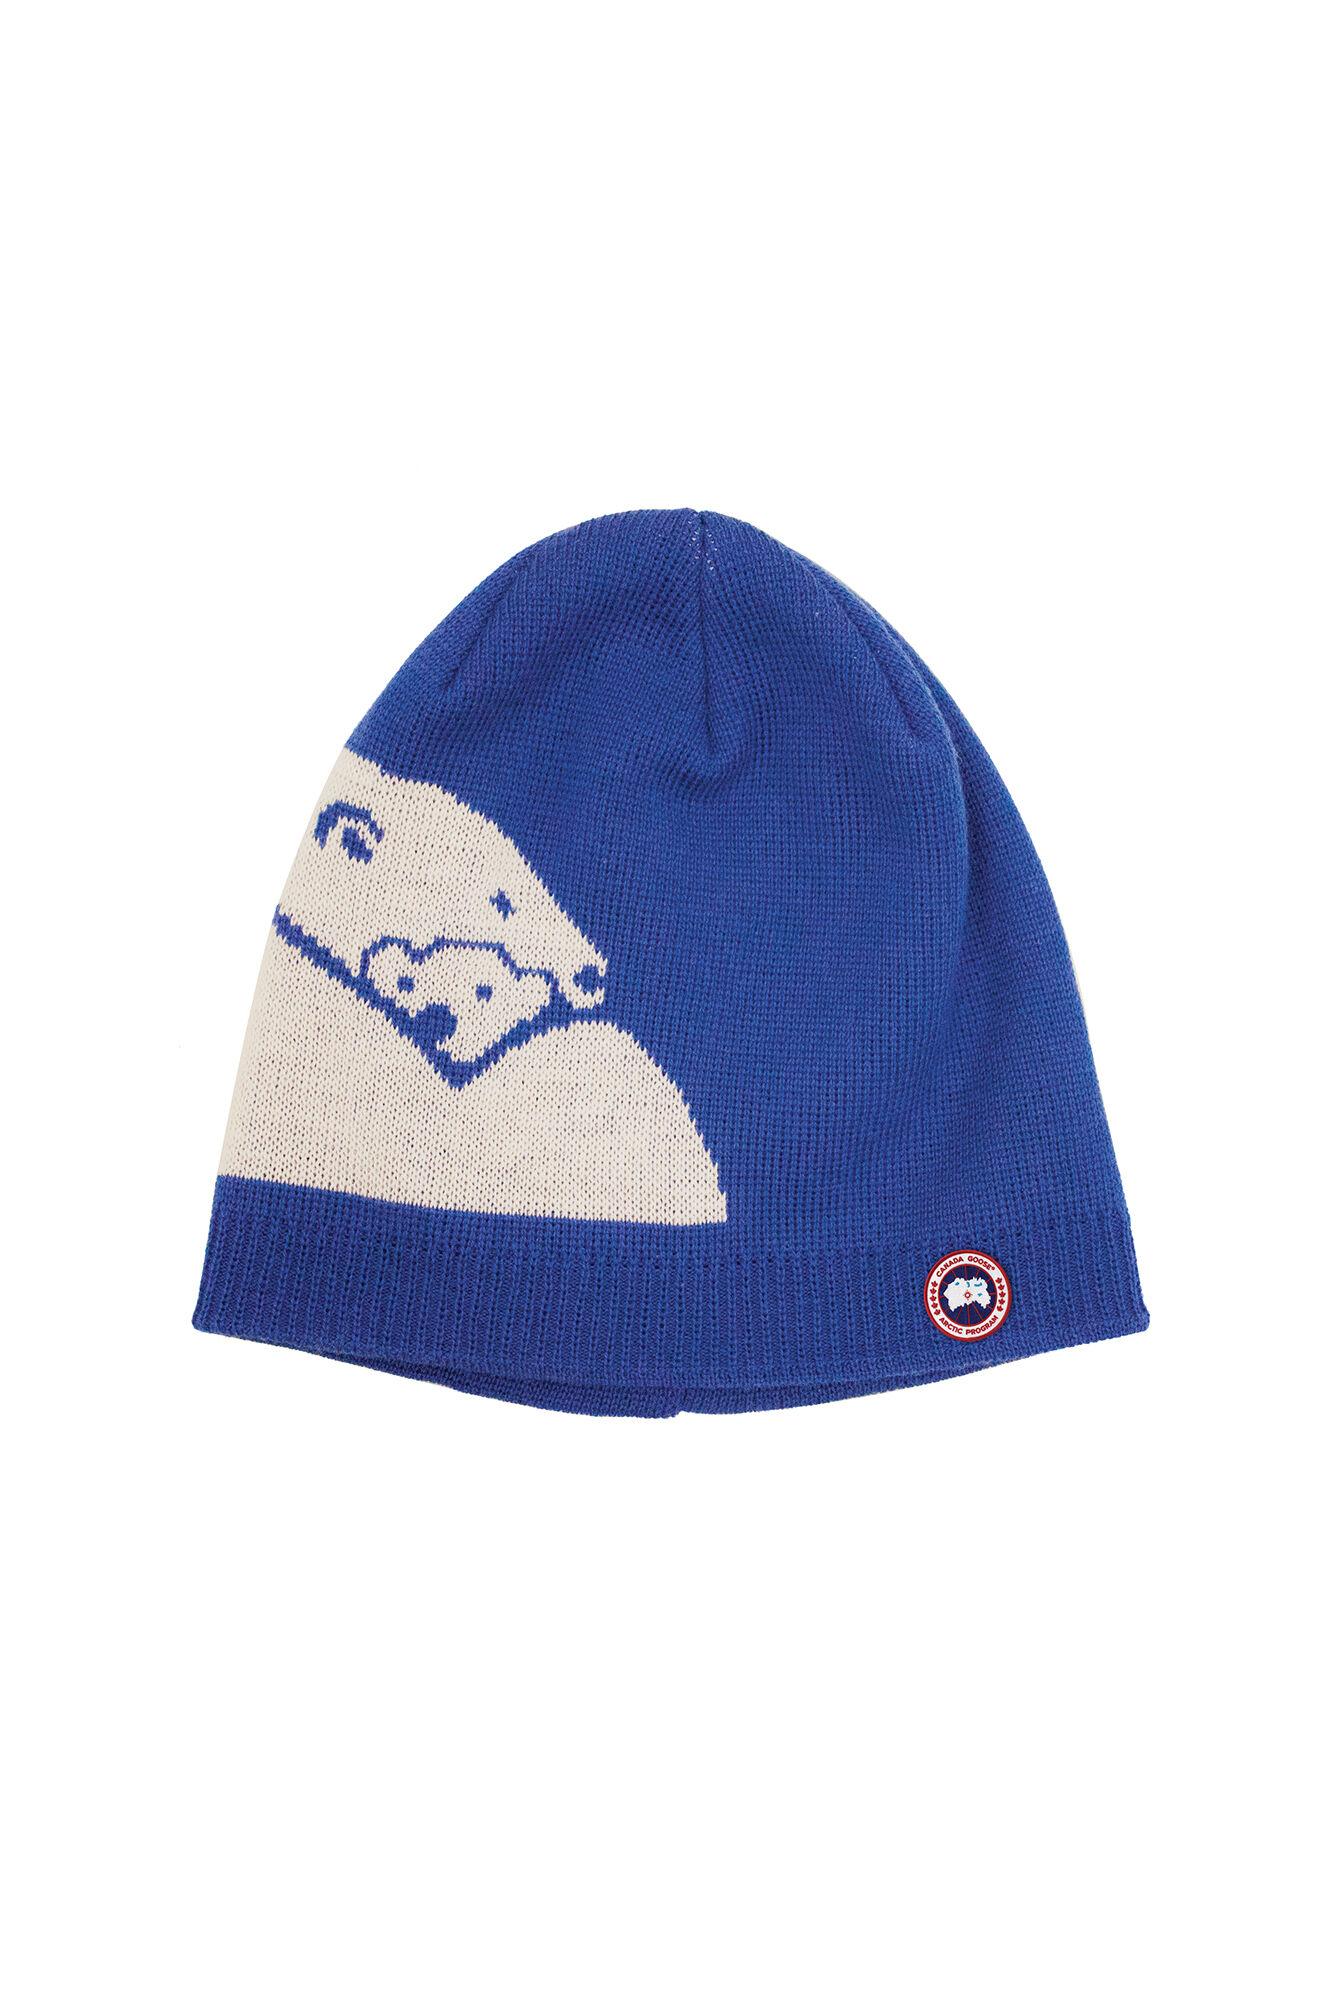 canada goose baby hat